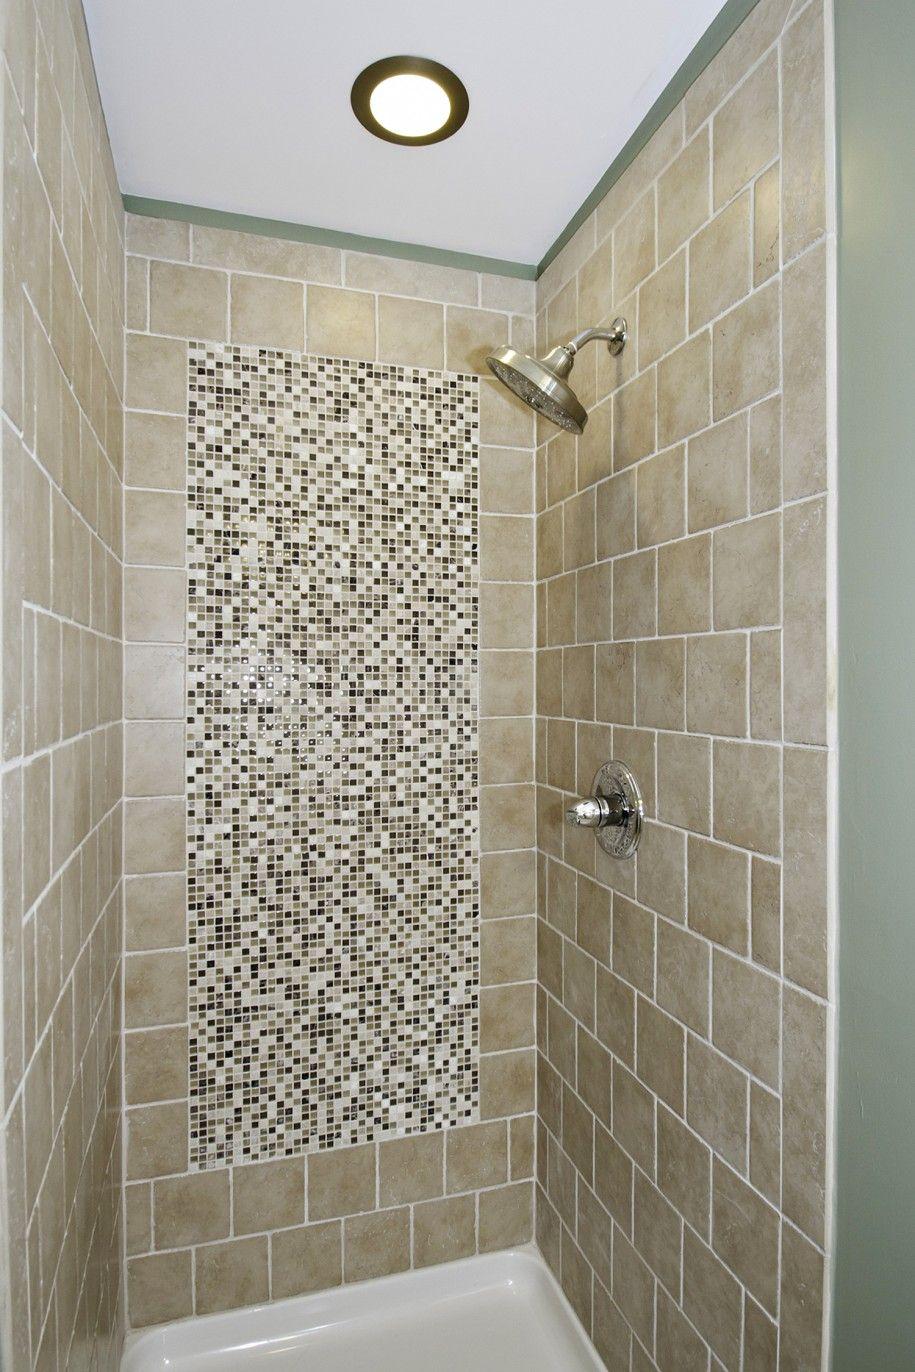 Splendid Image Of Bathroom Decoration Using Stand Up ...